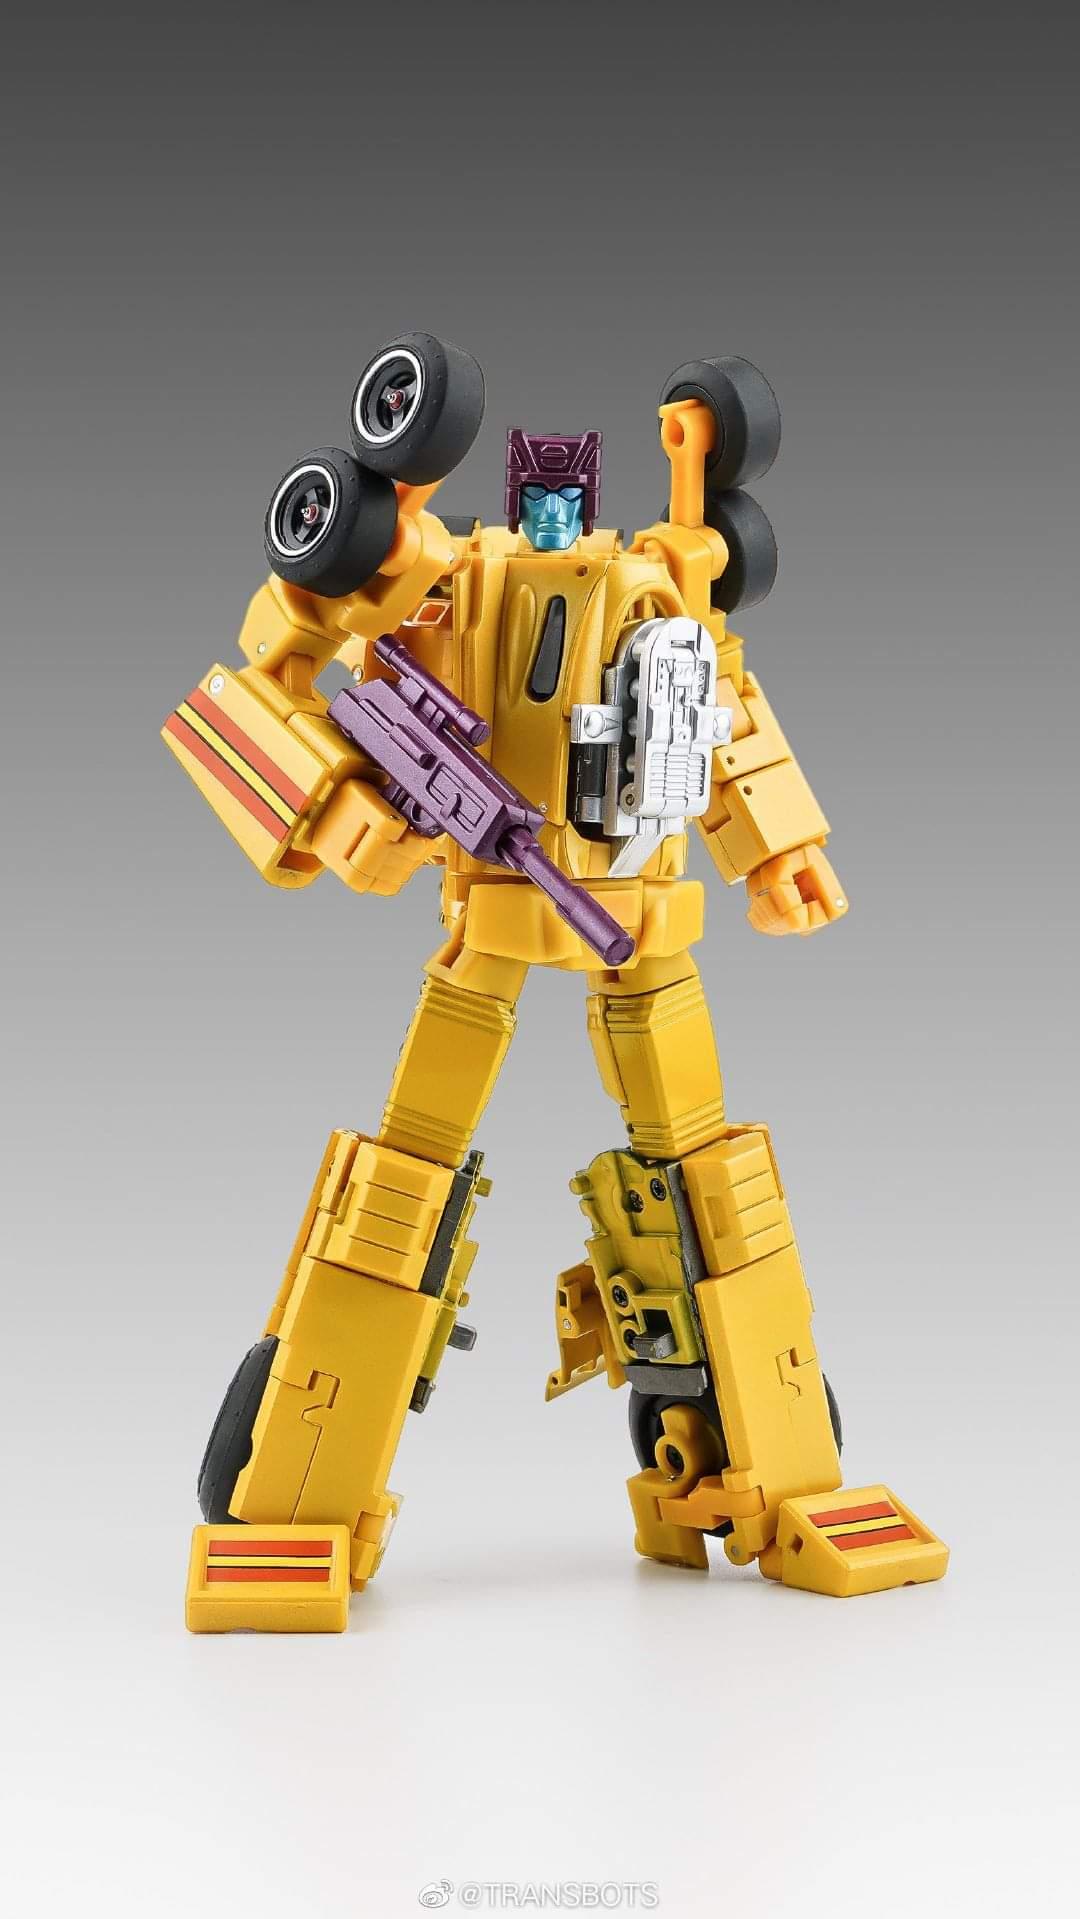 [X-Transbots] Produit Tiers - Jouets Berserkars forme Monolith (MX-XIII à MX-VII) - aka Stunticons forme Menasor/Menaseur - Page 6 Mk56sNAQ_o